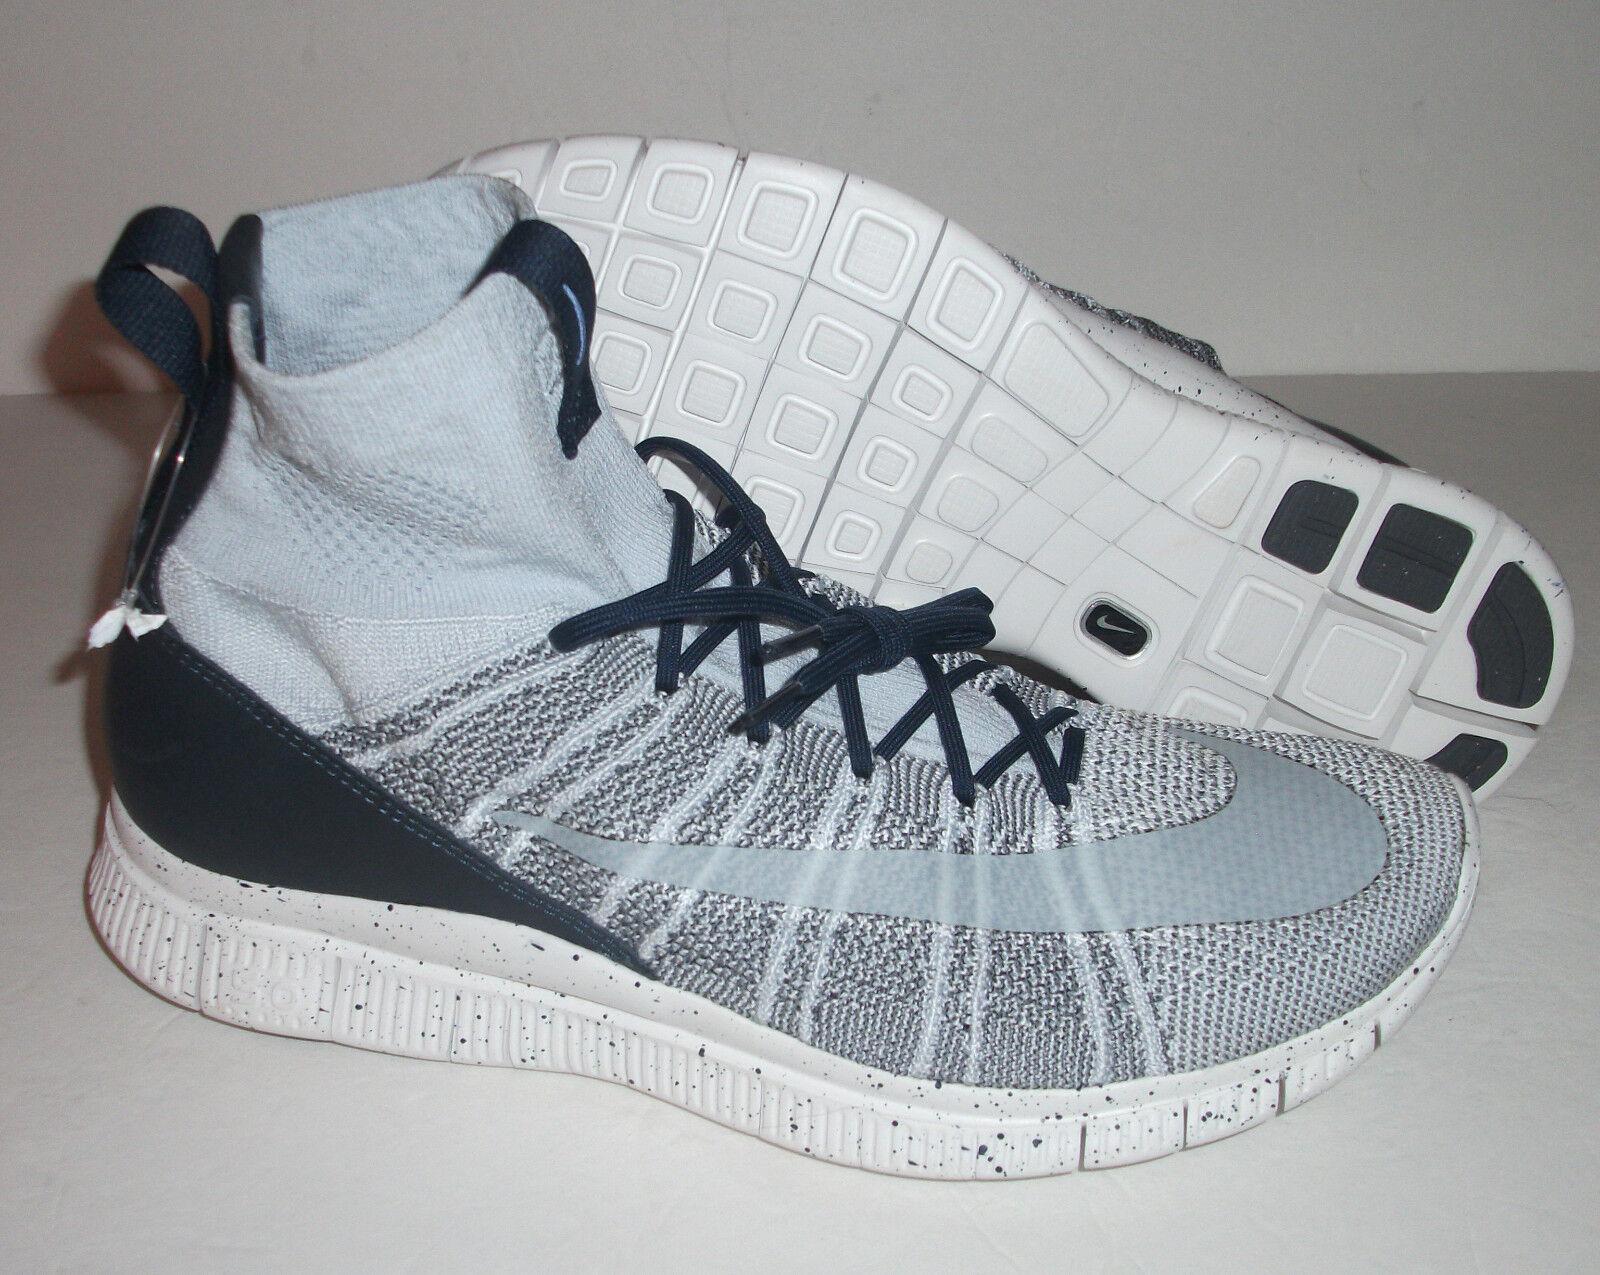 New Men's Nike Free Flyknit Mercurial, Men's New Size 13, Platinum/Grey, 805554-001 bbf498